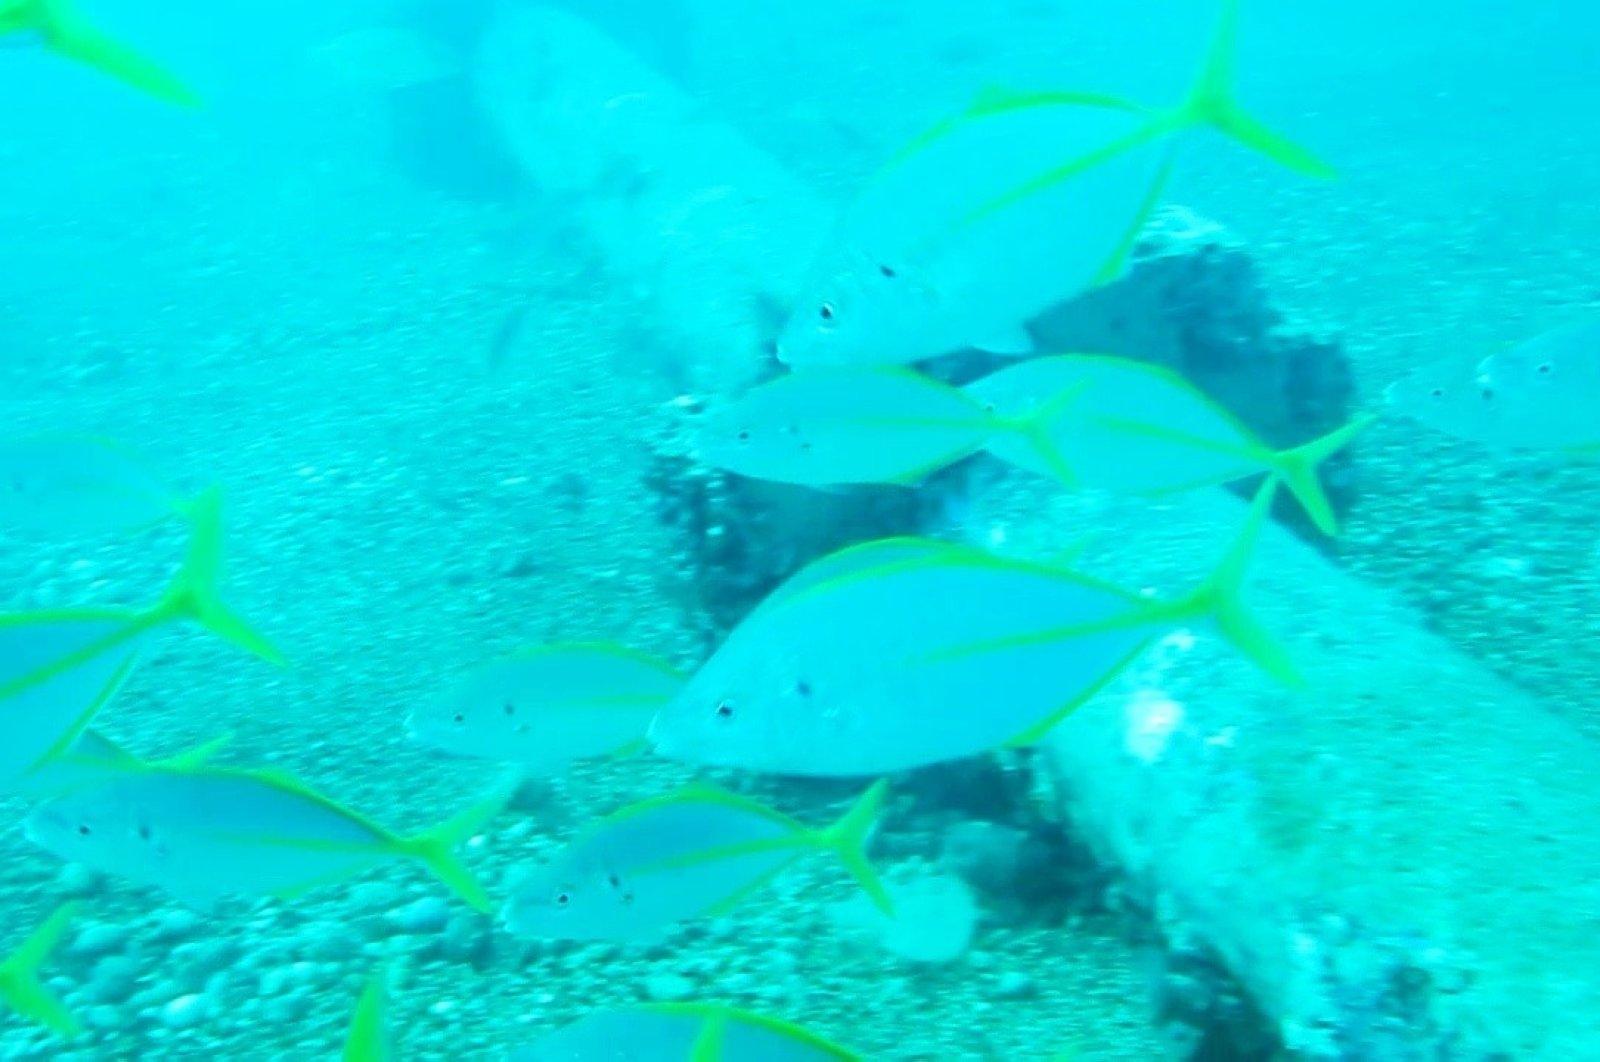 A school of fish swims off Konyaaltı Beach, in Antalya, southern Turkey, Aug. 11, 2020. (IHA Photo)